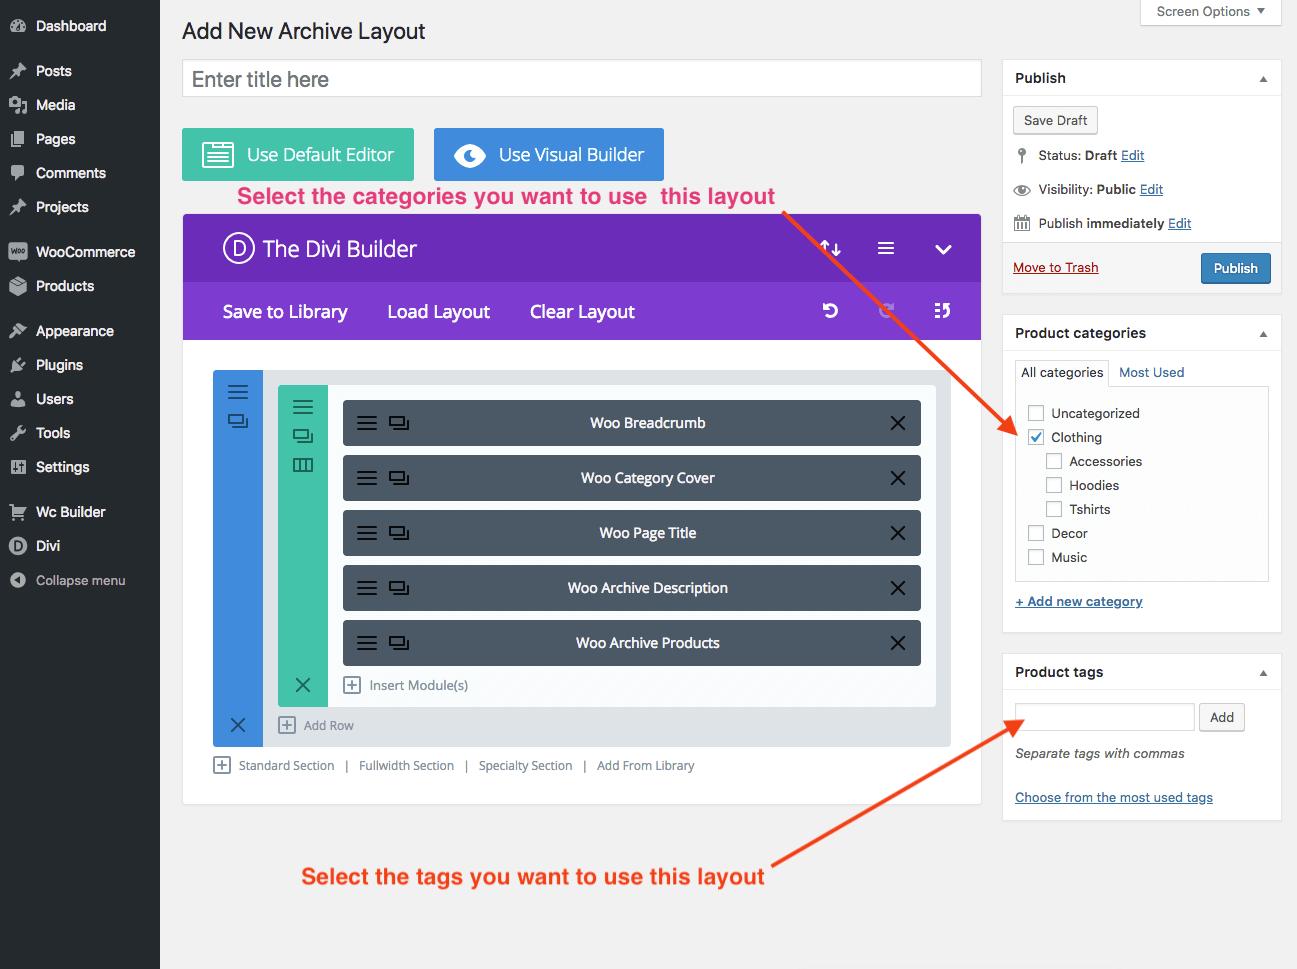 WooCommerce Builder 2 0 beta 1 + Visual Builder Support